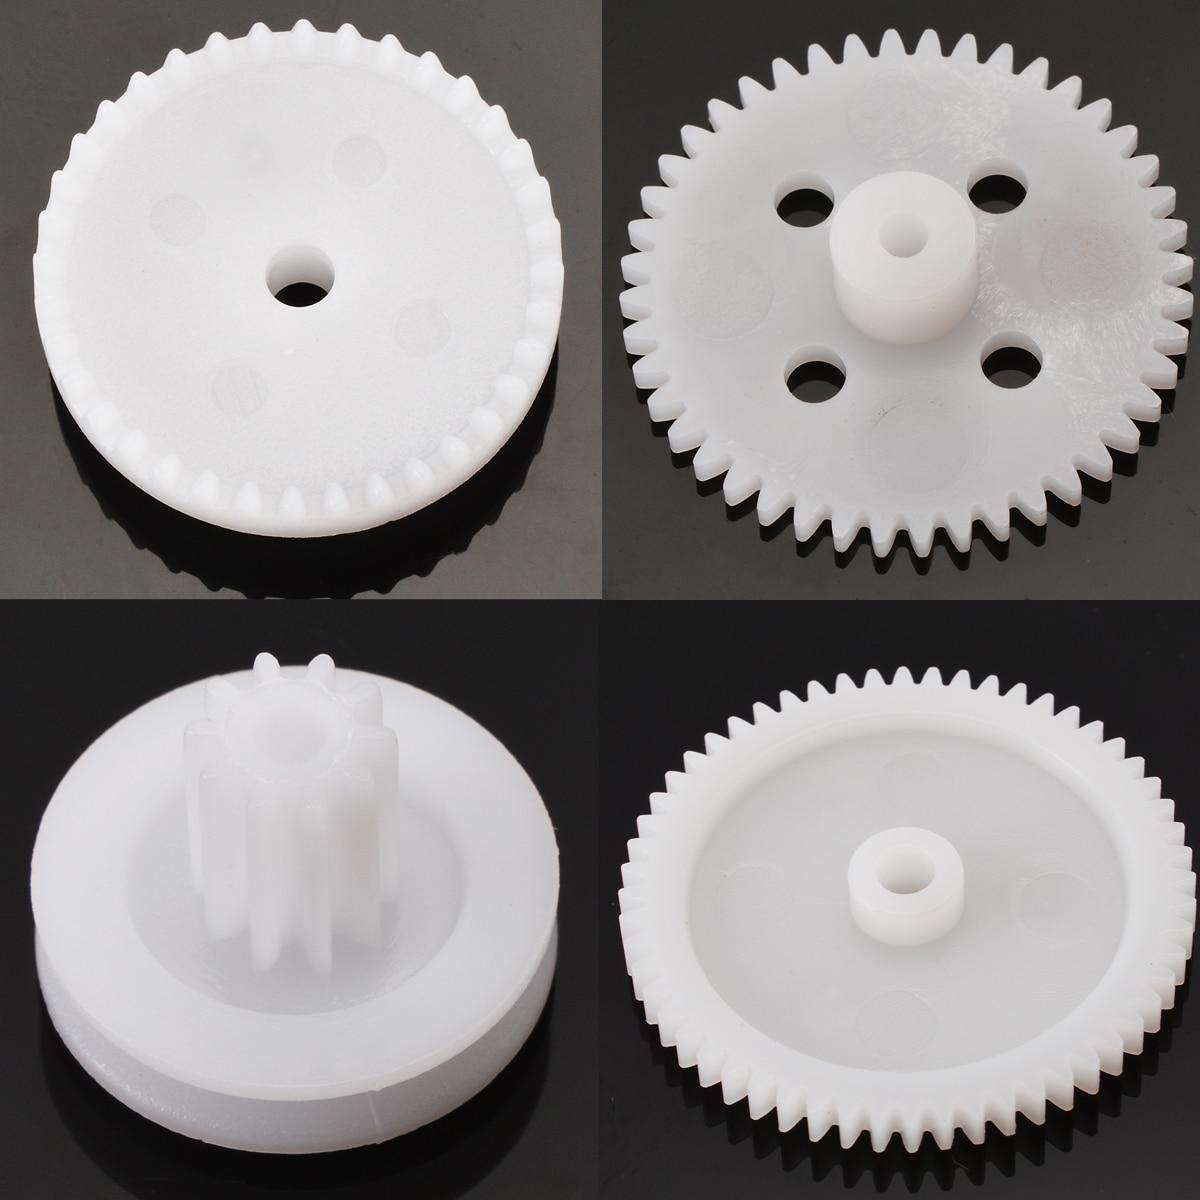 81pcs/set Plastic Gear Wheel Assorted Kit For Toy Car Motor Robot Shaft Model Crafts